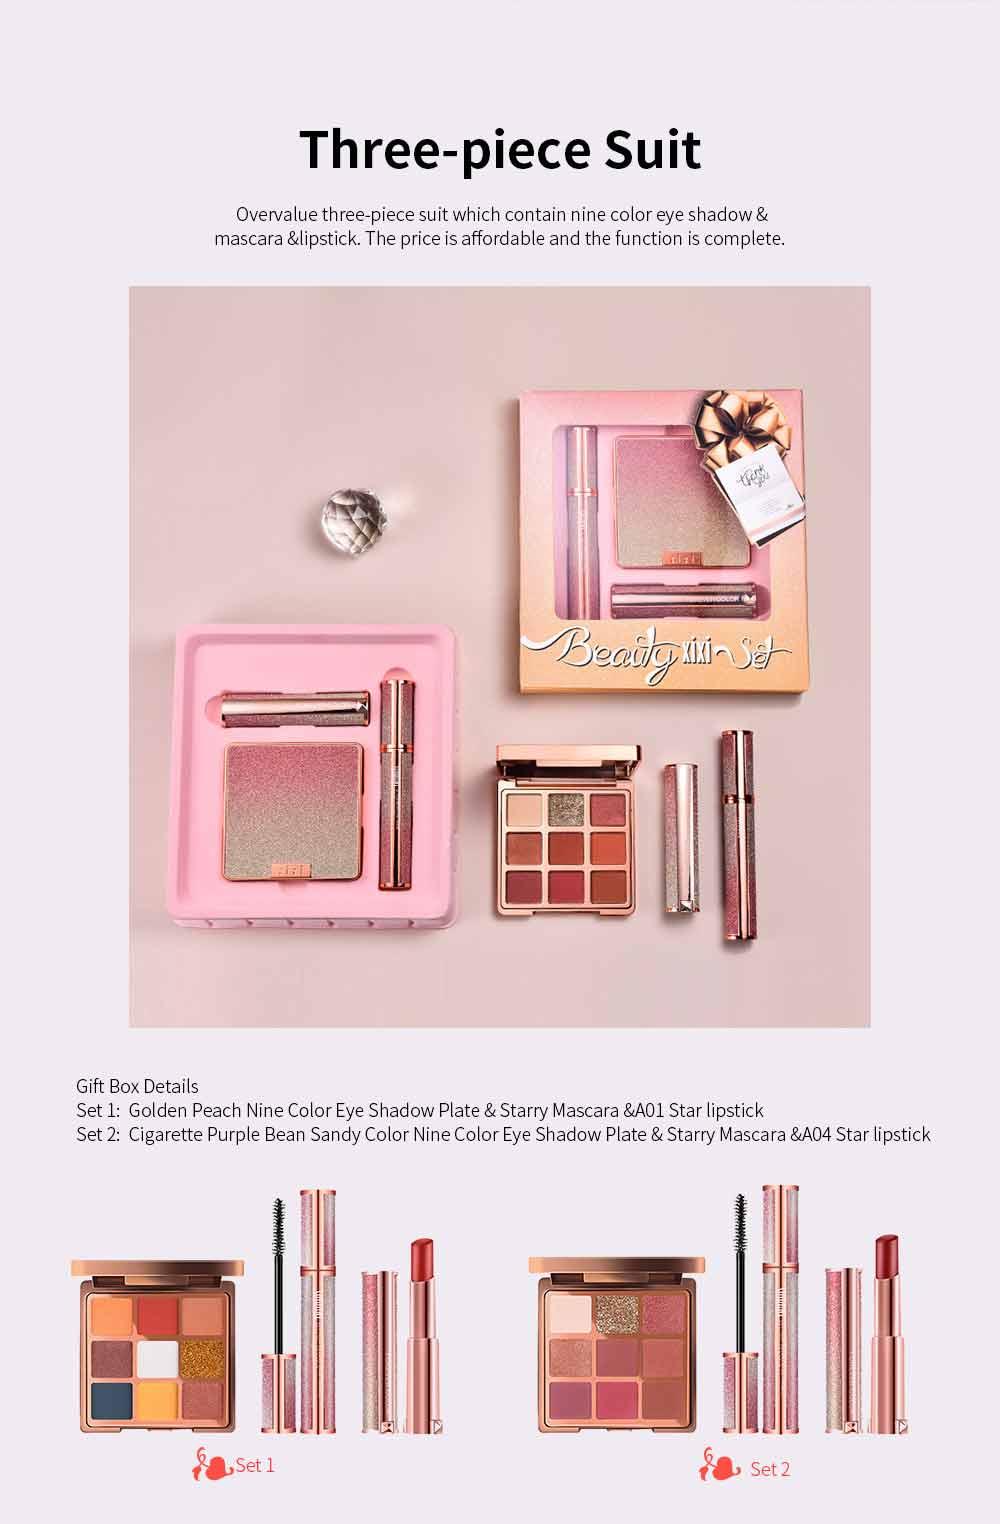 9 Color Eye Shadow & Mascara & Lipstick Set Beauty Makeup Birthday Cosmetic Gift Box Set 1